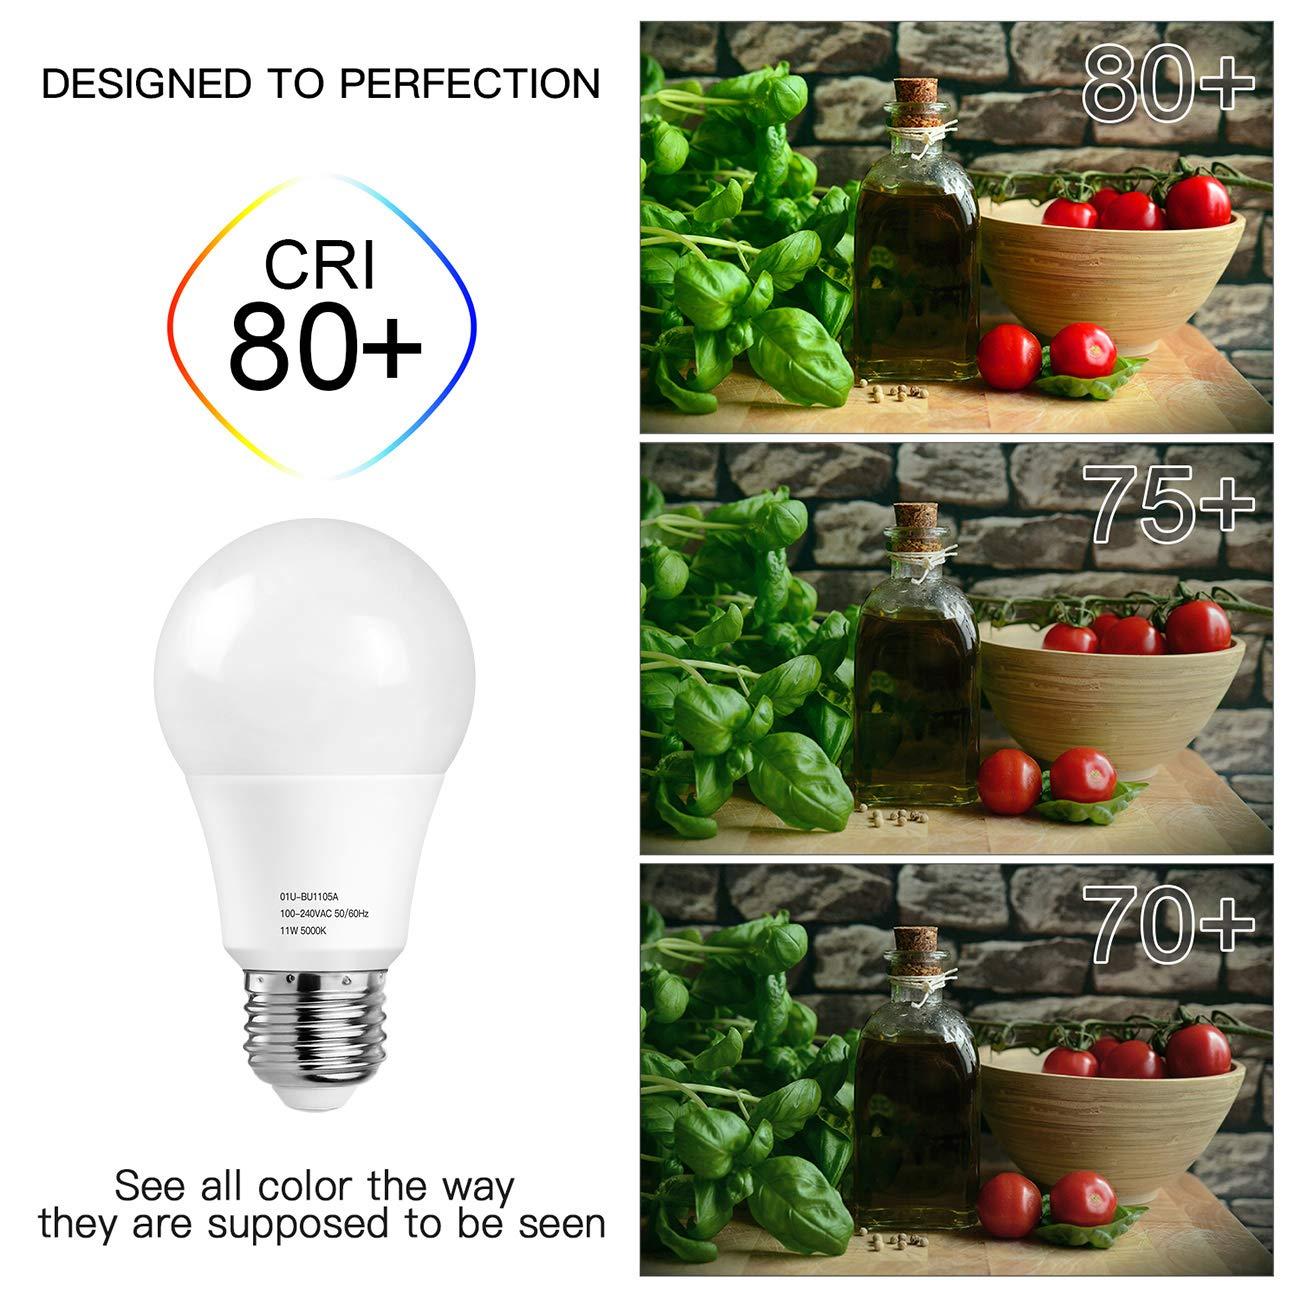 A19 LED Light Bulbs 5000K, 100 Watt Equivalent LED Bulb Daylight White, 1100Lumens, Non Dimmable, Medium Screw Base (E26), CRI80+, 12-Pack by MAXvolador (Image #5)